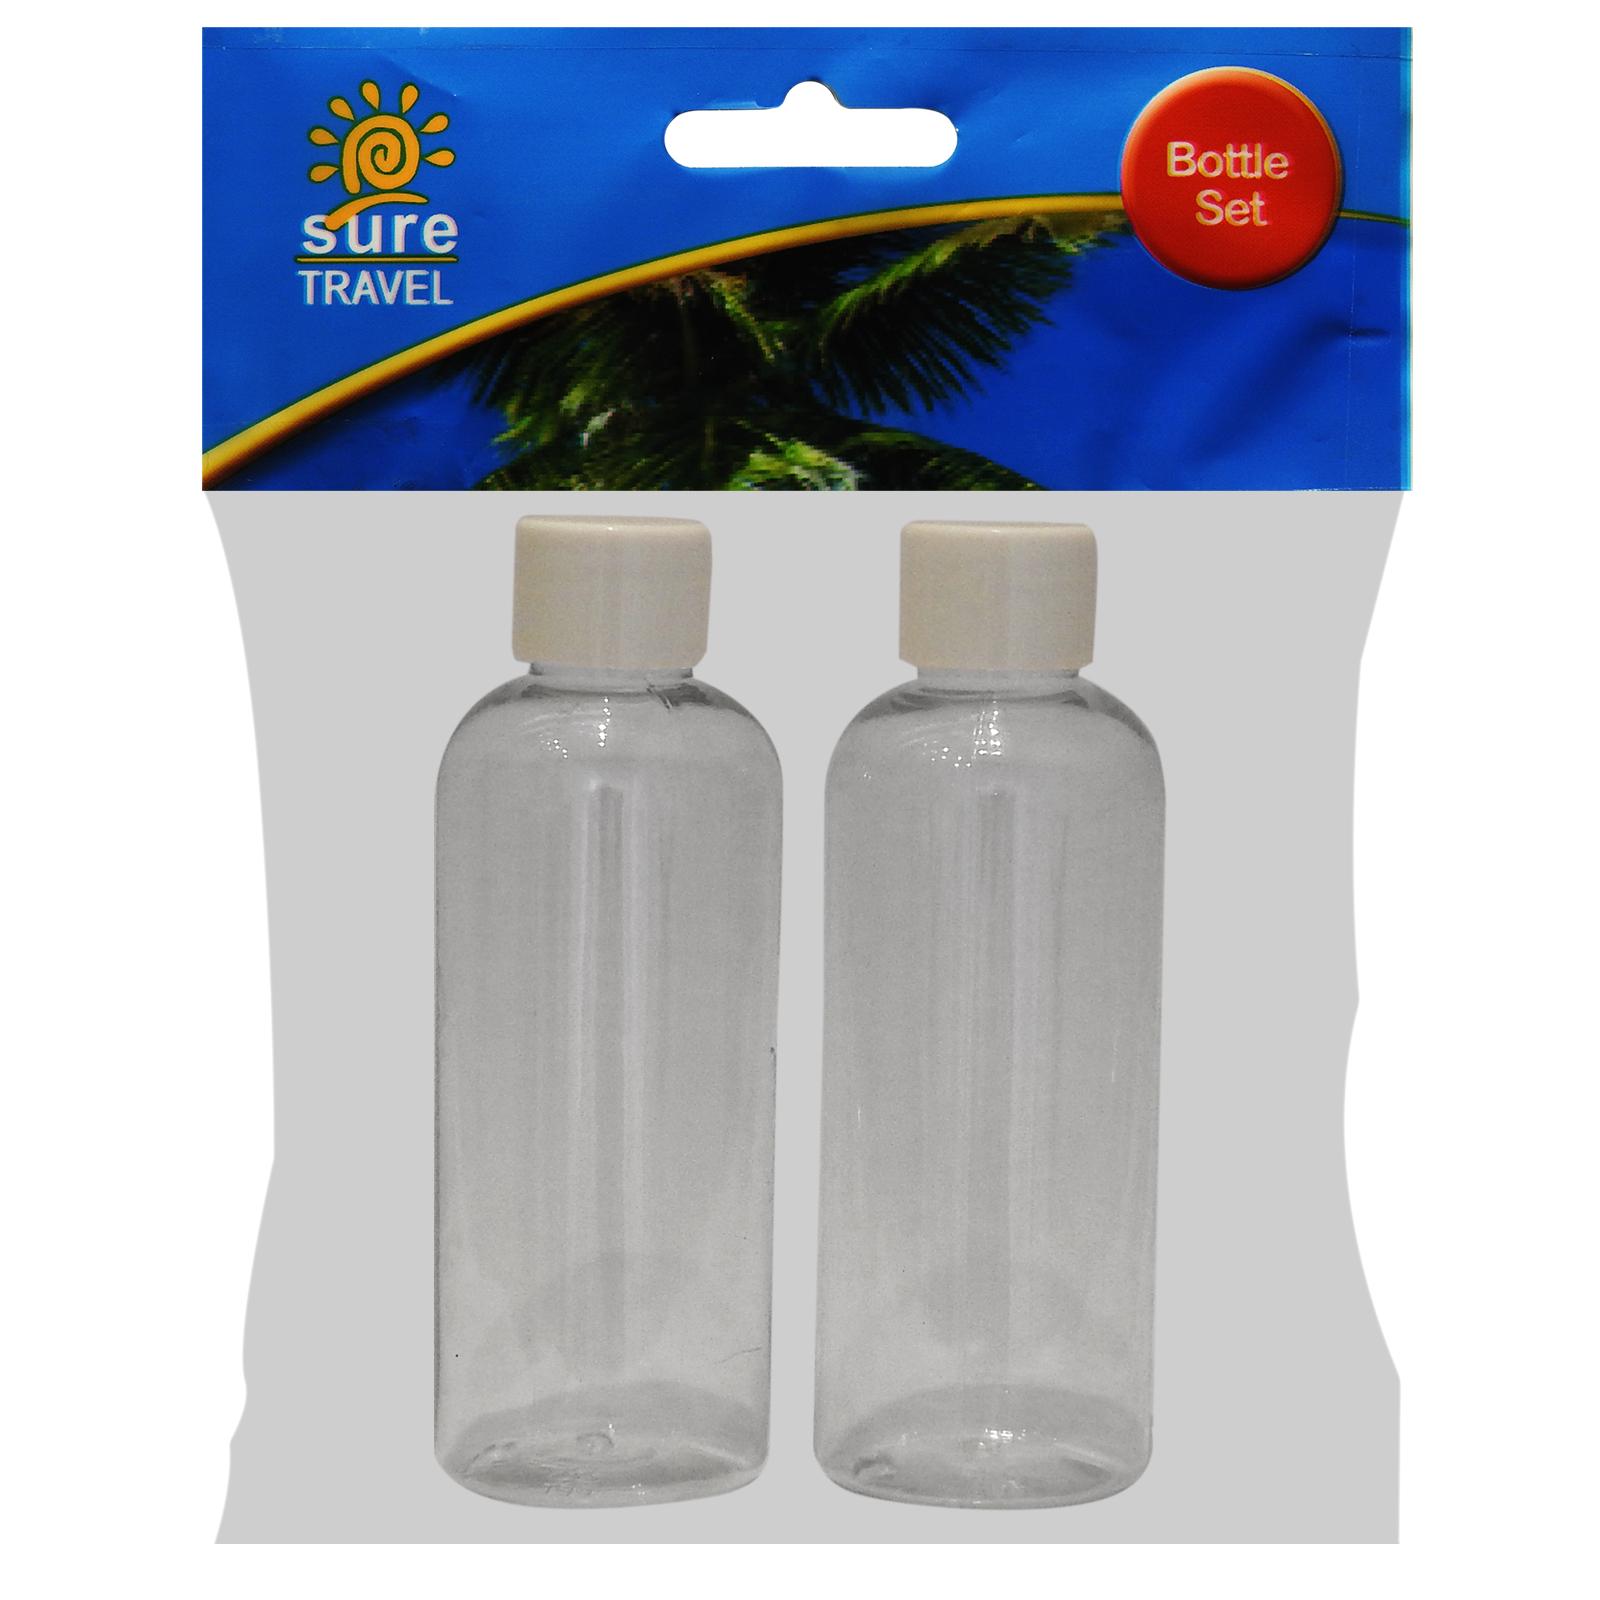 how to clean plastic e liquid bottles